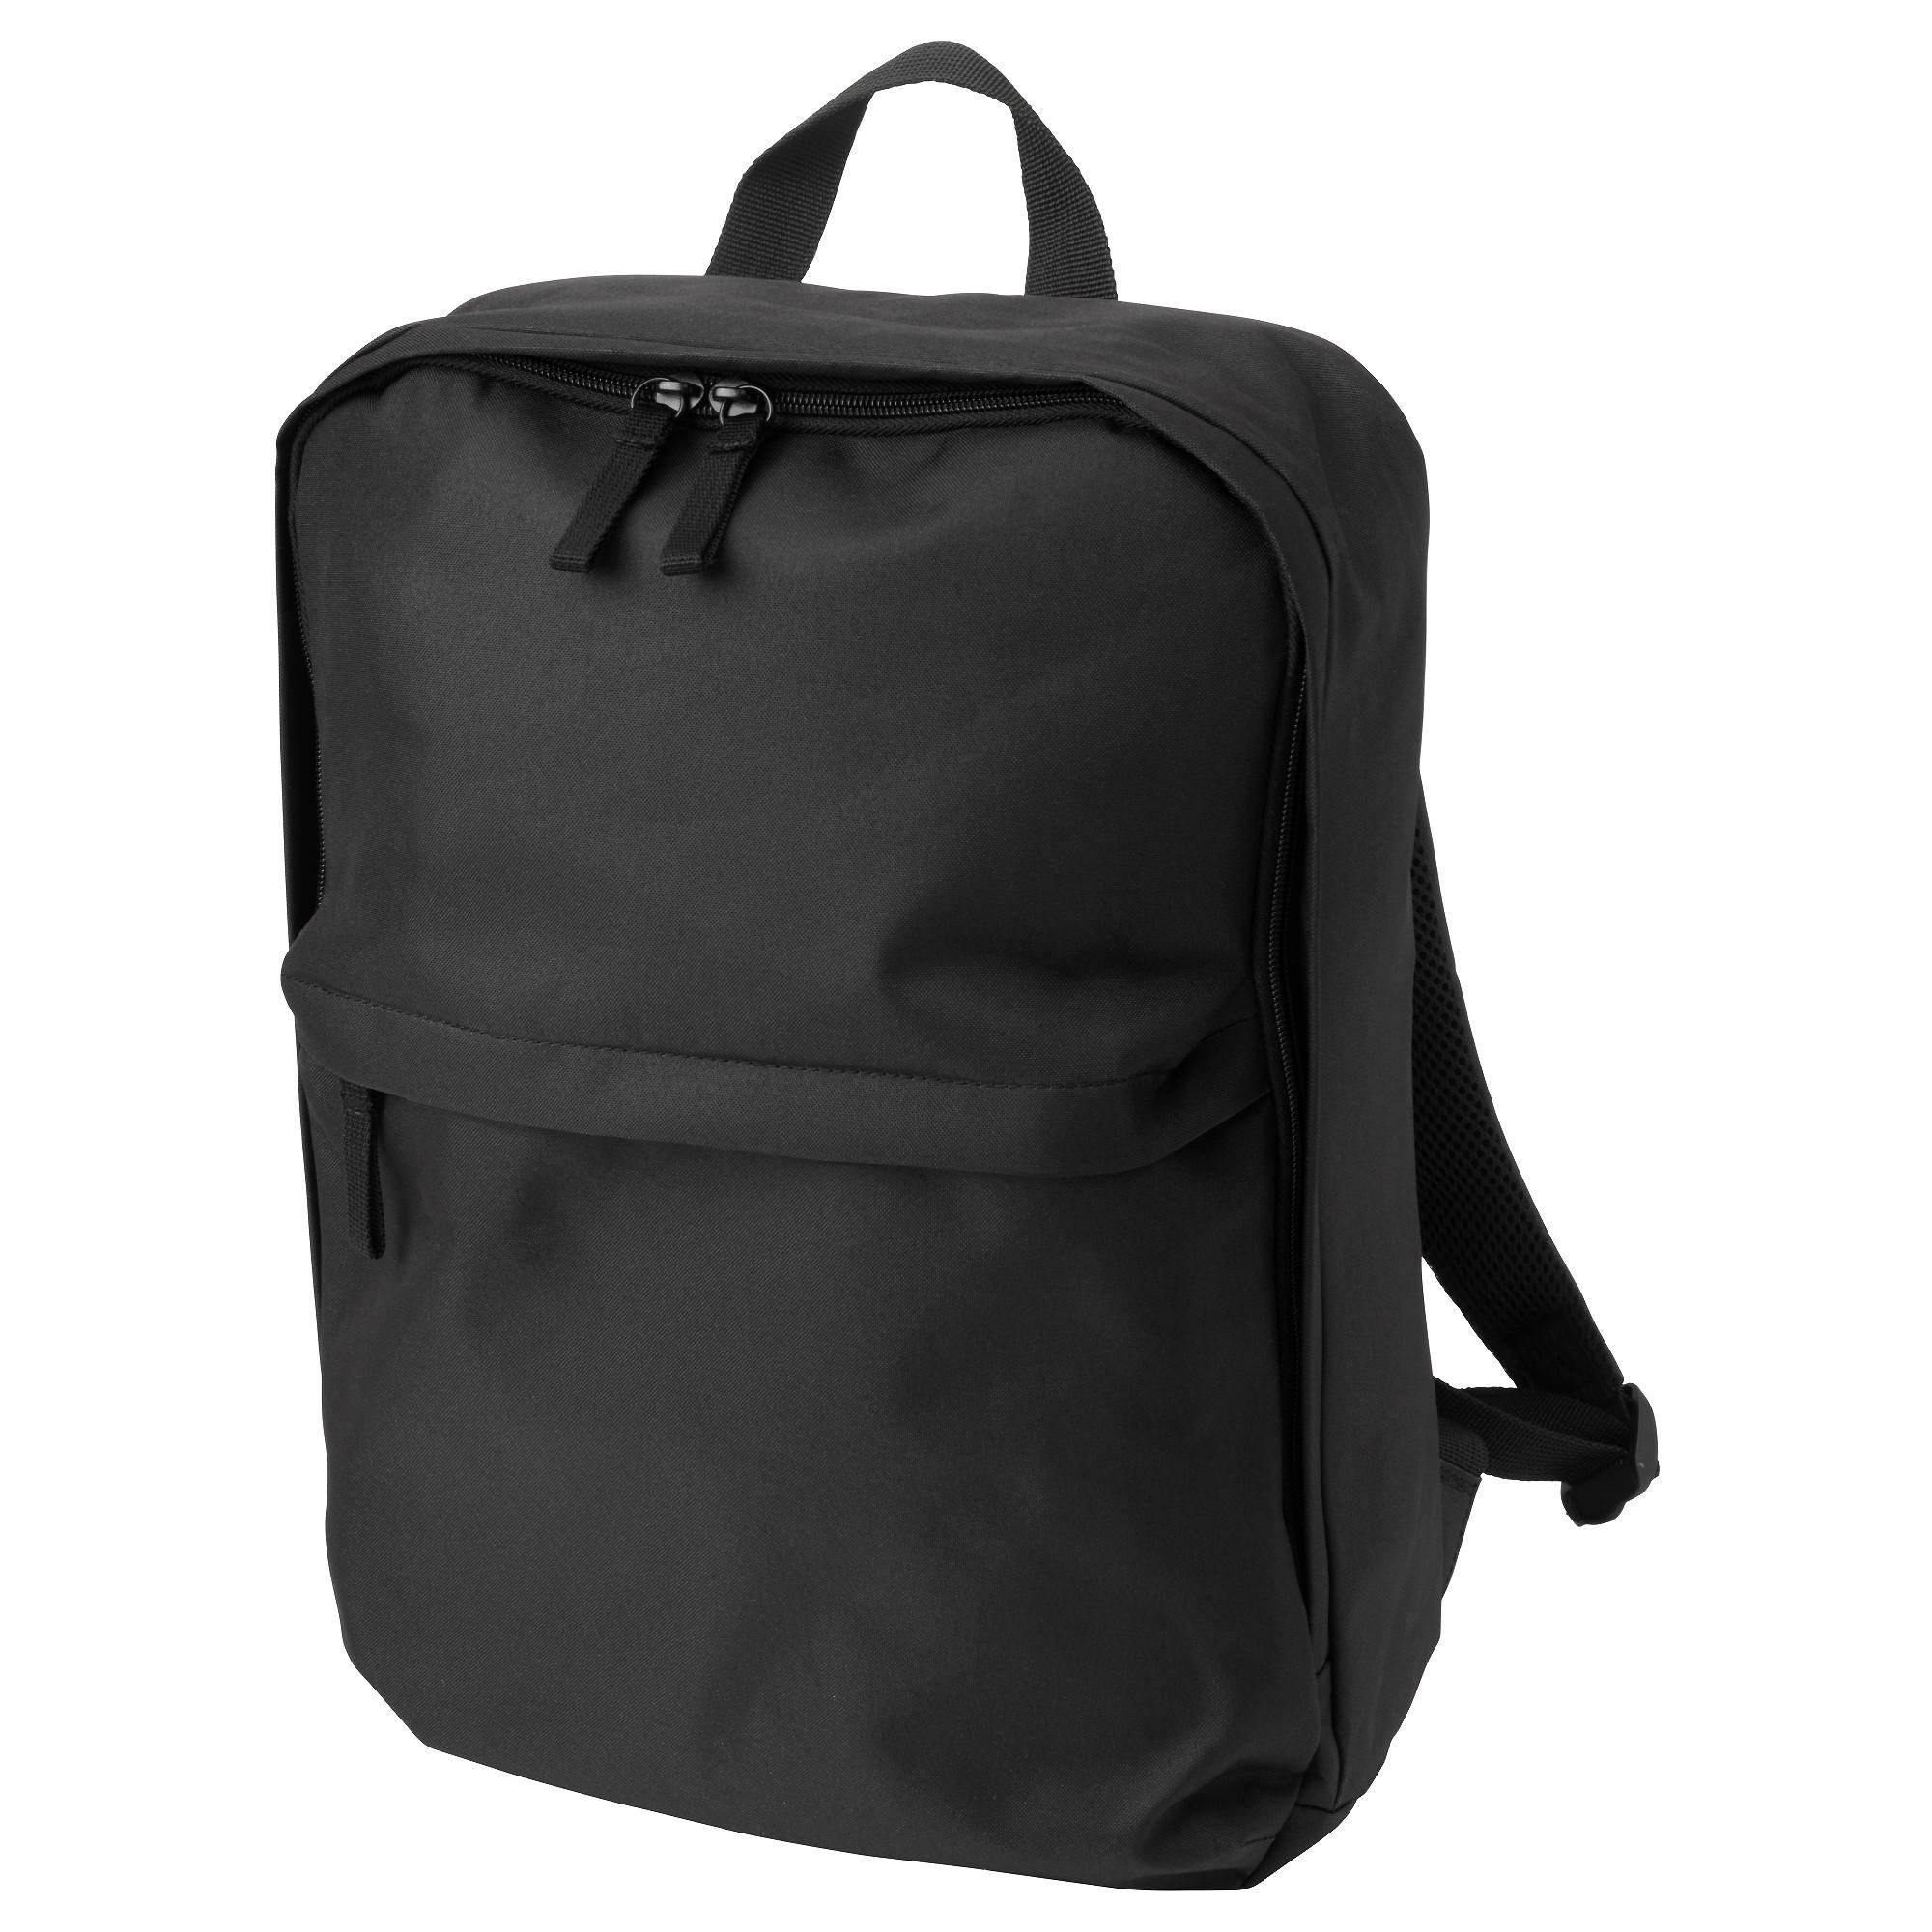 Онлайн магазин рюкзаки рюкзаки оксфорт екатеринбург